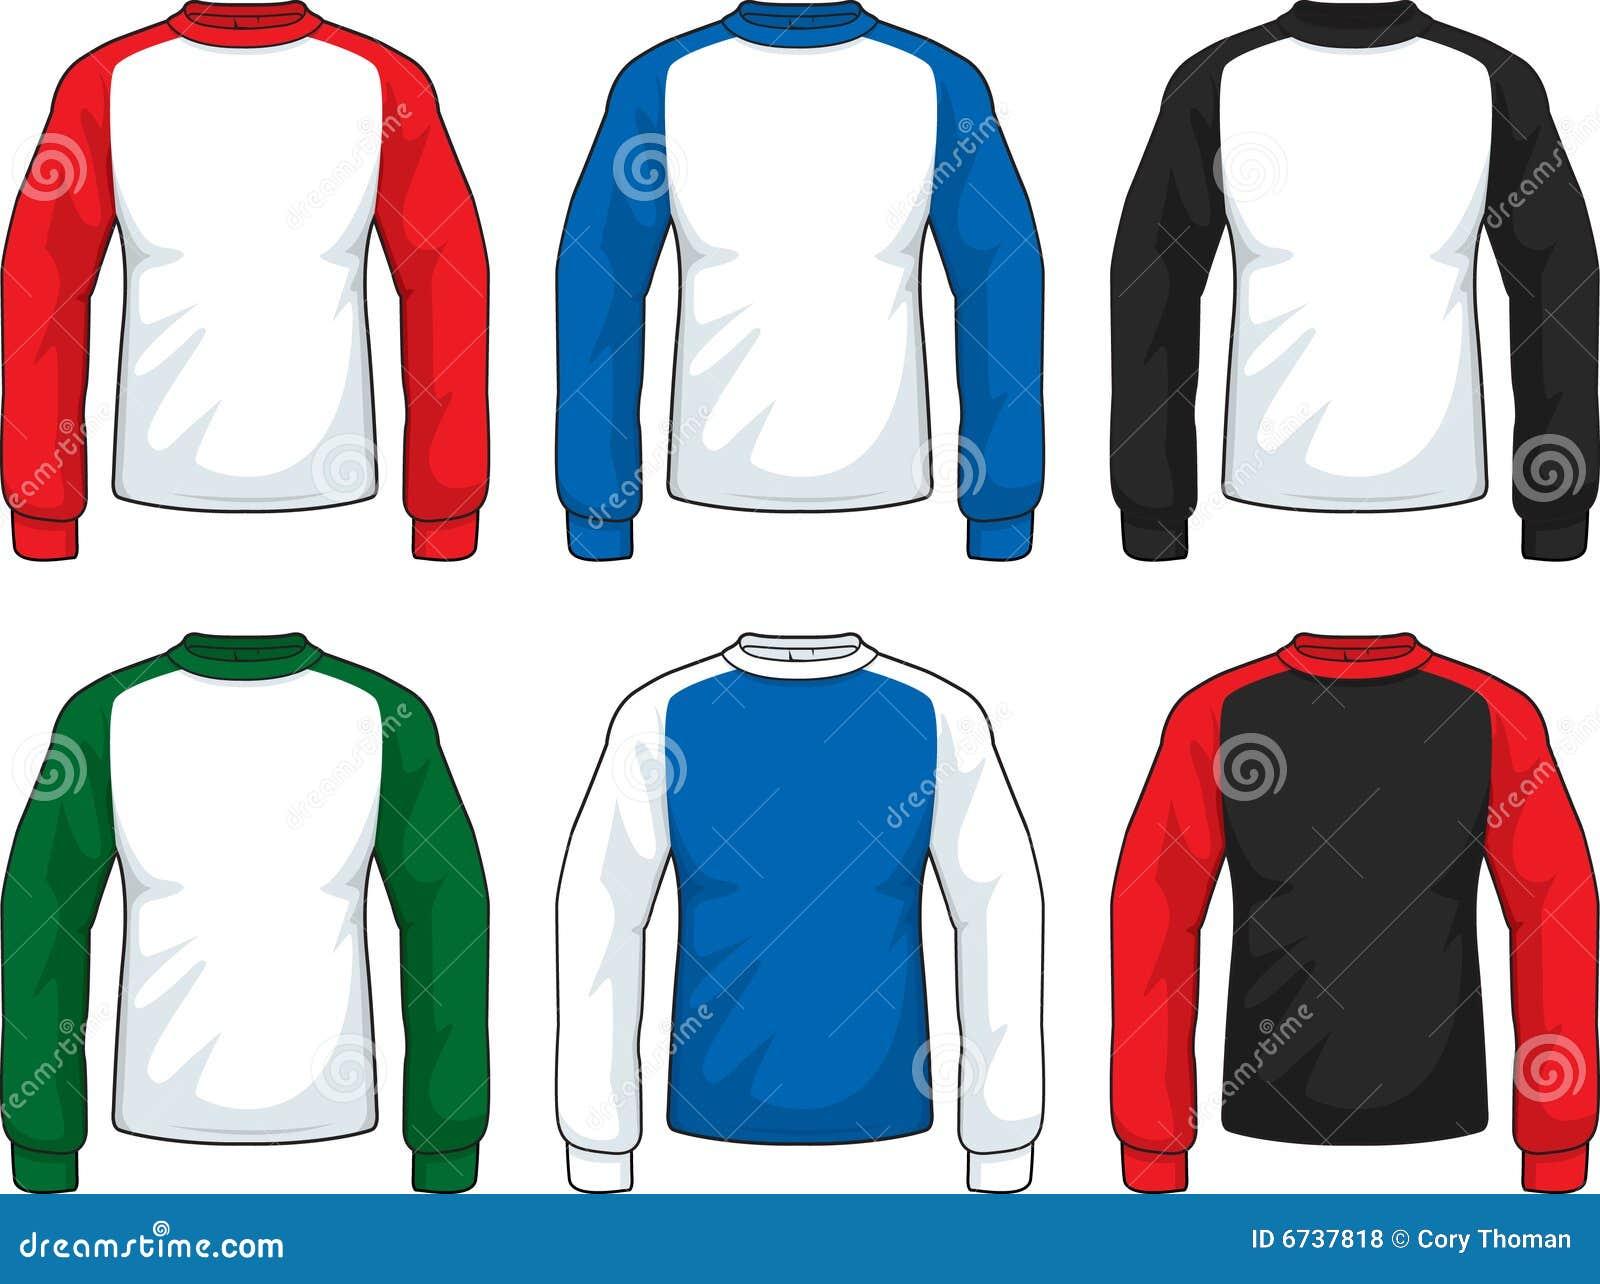 Raglan T Shirt Royalty Free Stock Photos Image 6737818